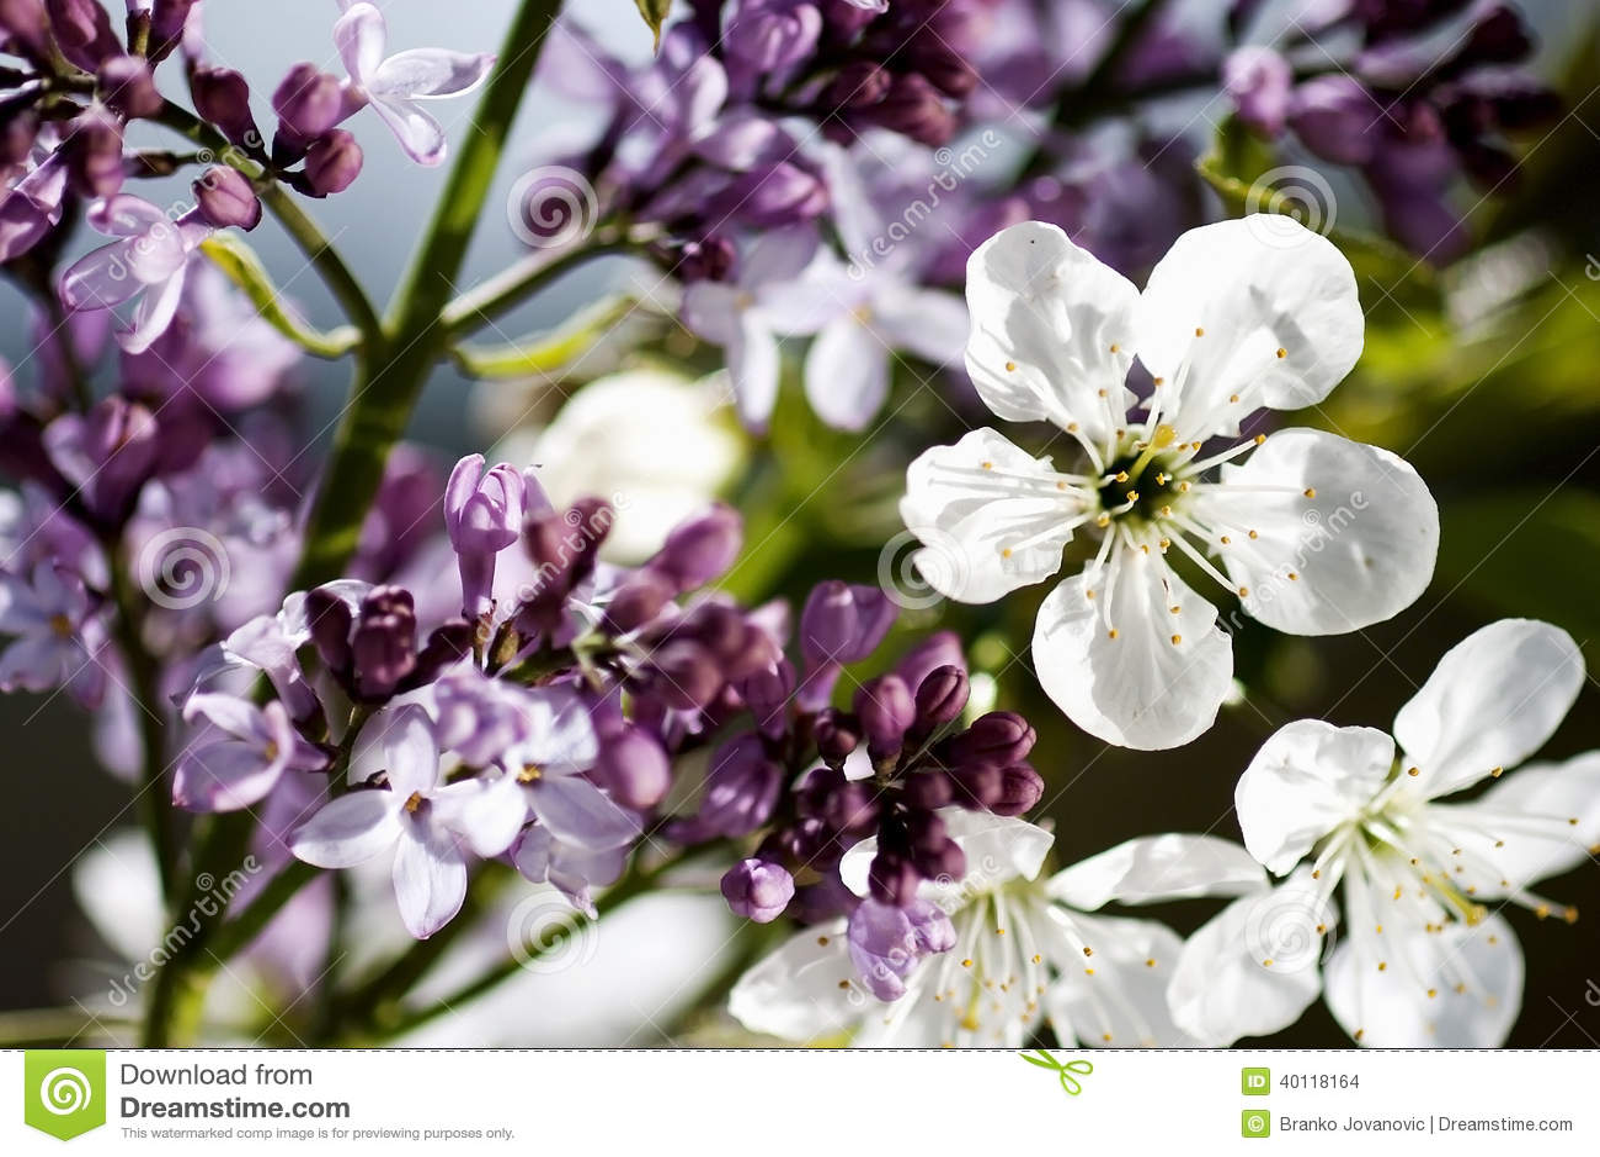 of purple white - photo #35